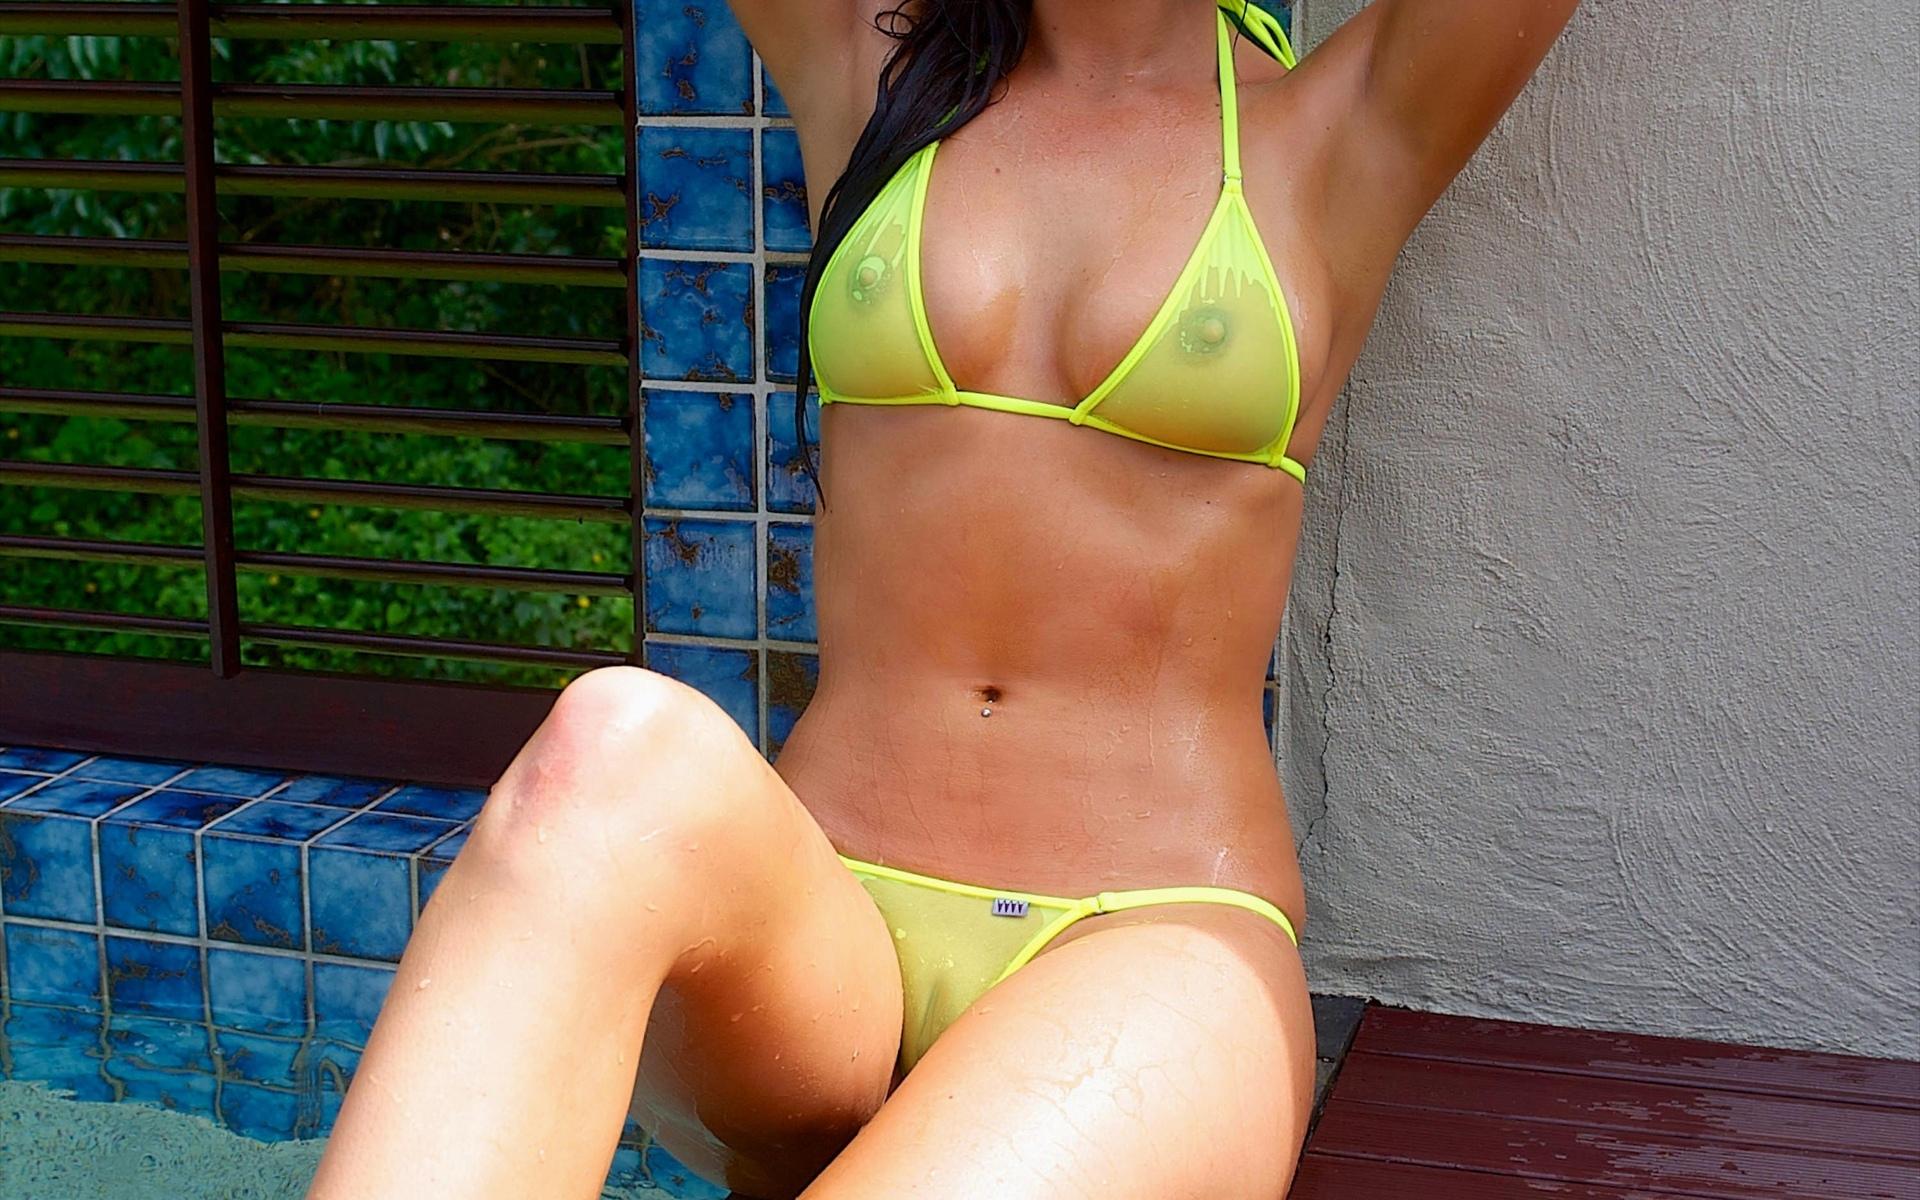 девушка, купальник, мокрый, живот